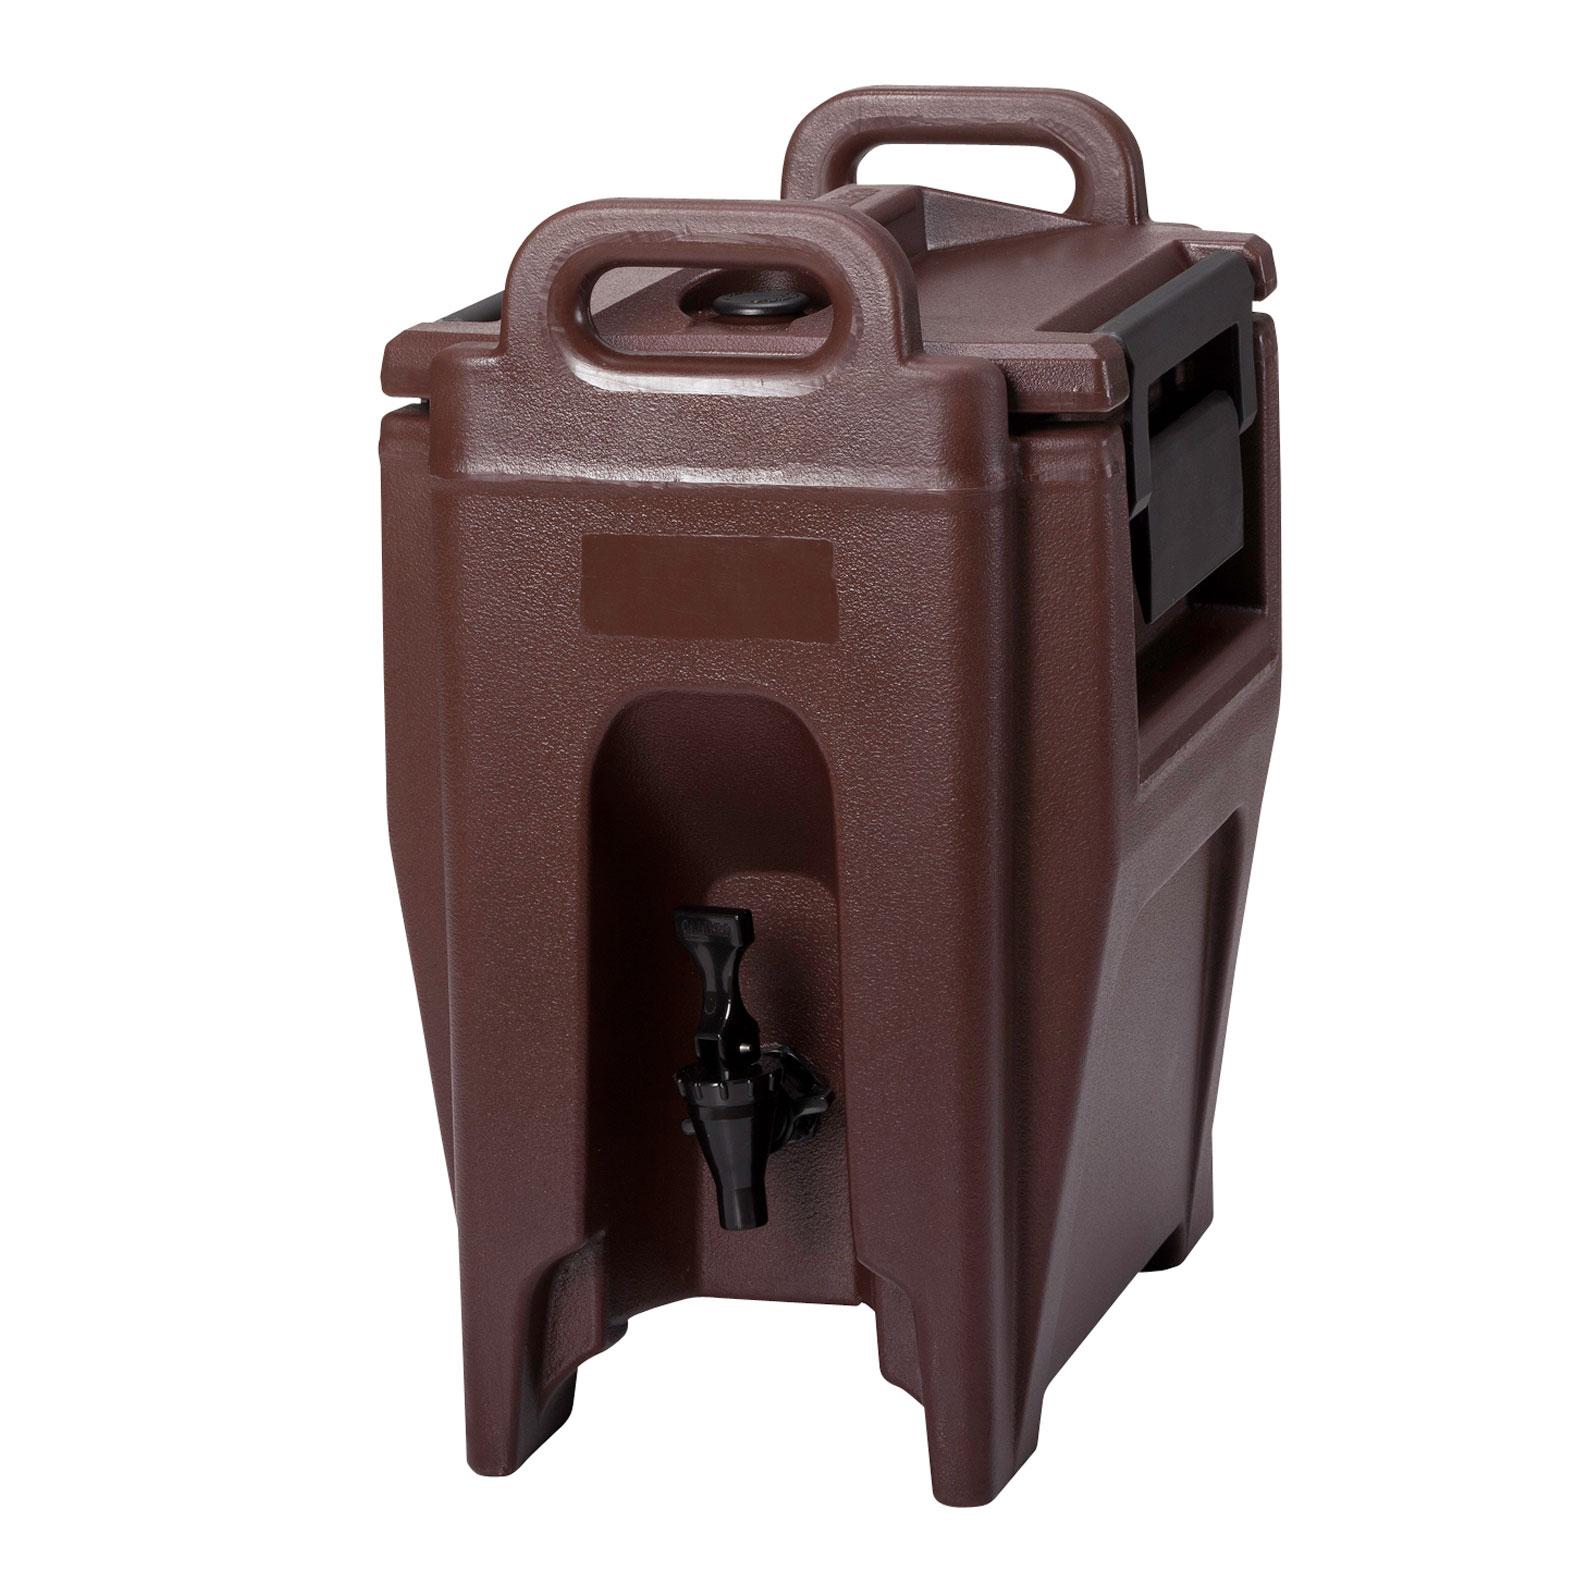 Cambro UC250131 beverage dispenser, insulated